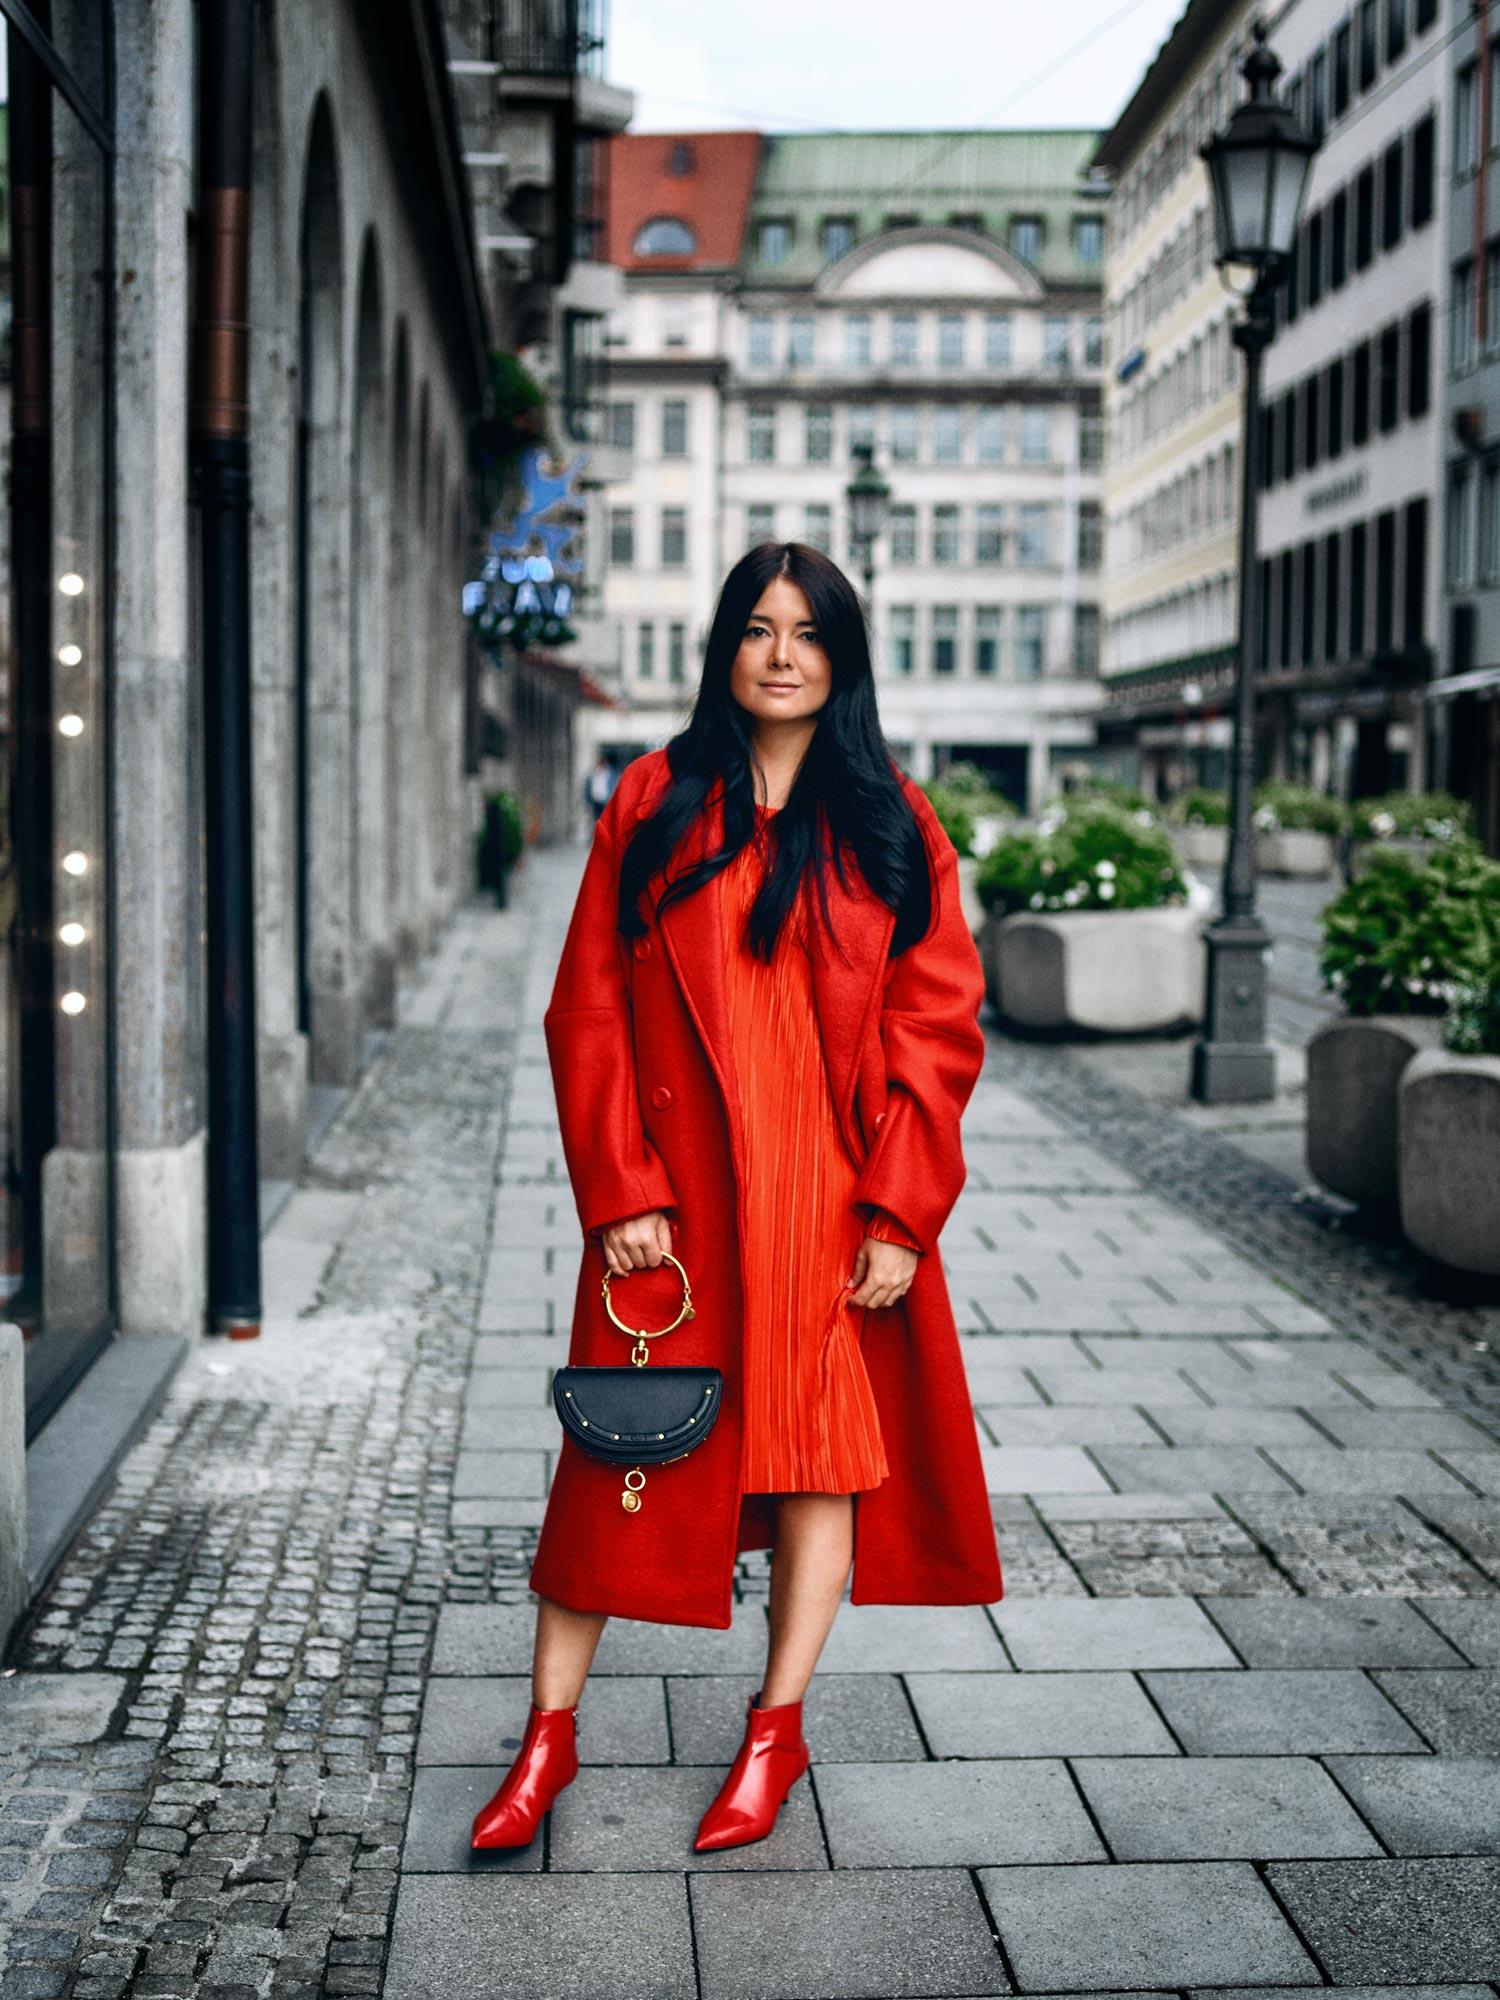 fashionambit-travelblog-muenchen-modeblog-deutschland-blogger-modeblogger-fashionblogger-bloggerdeutschland-lifestyleblog-munich-style-blog-trendfarbe-rot-allover-look